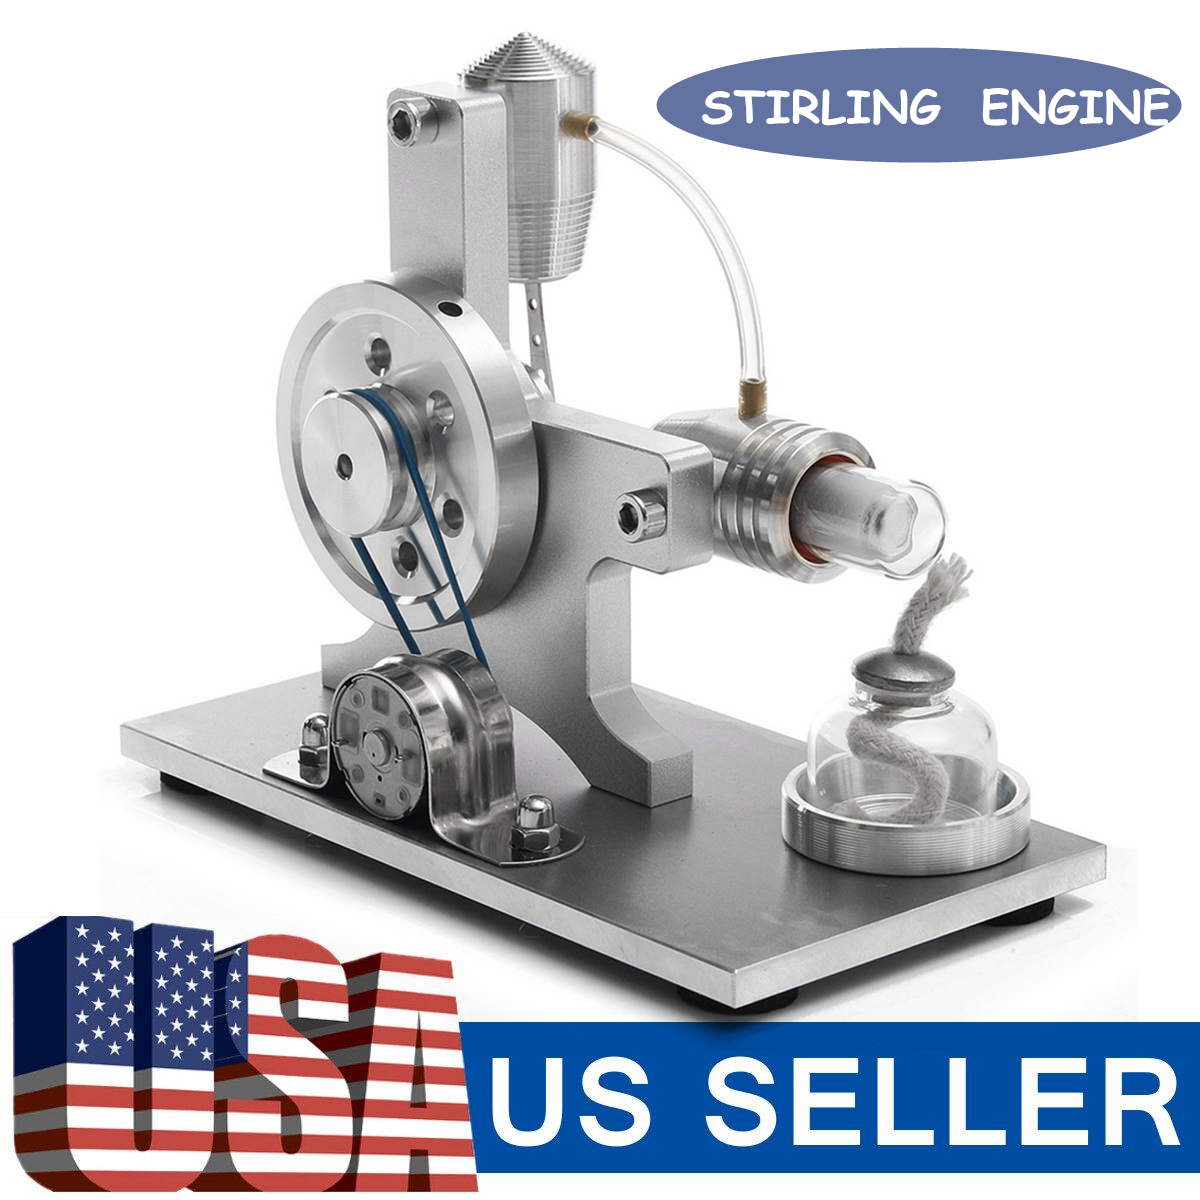 Hot Air Stirling Engine Electricity Motor Steam Heat Kids Educational Model